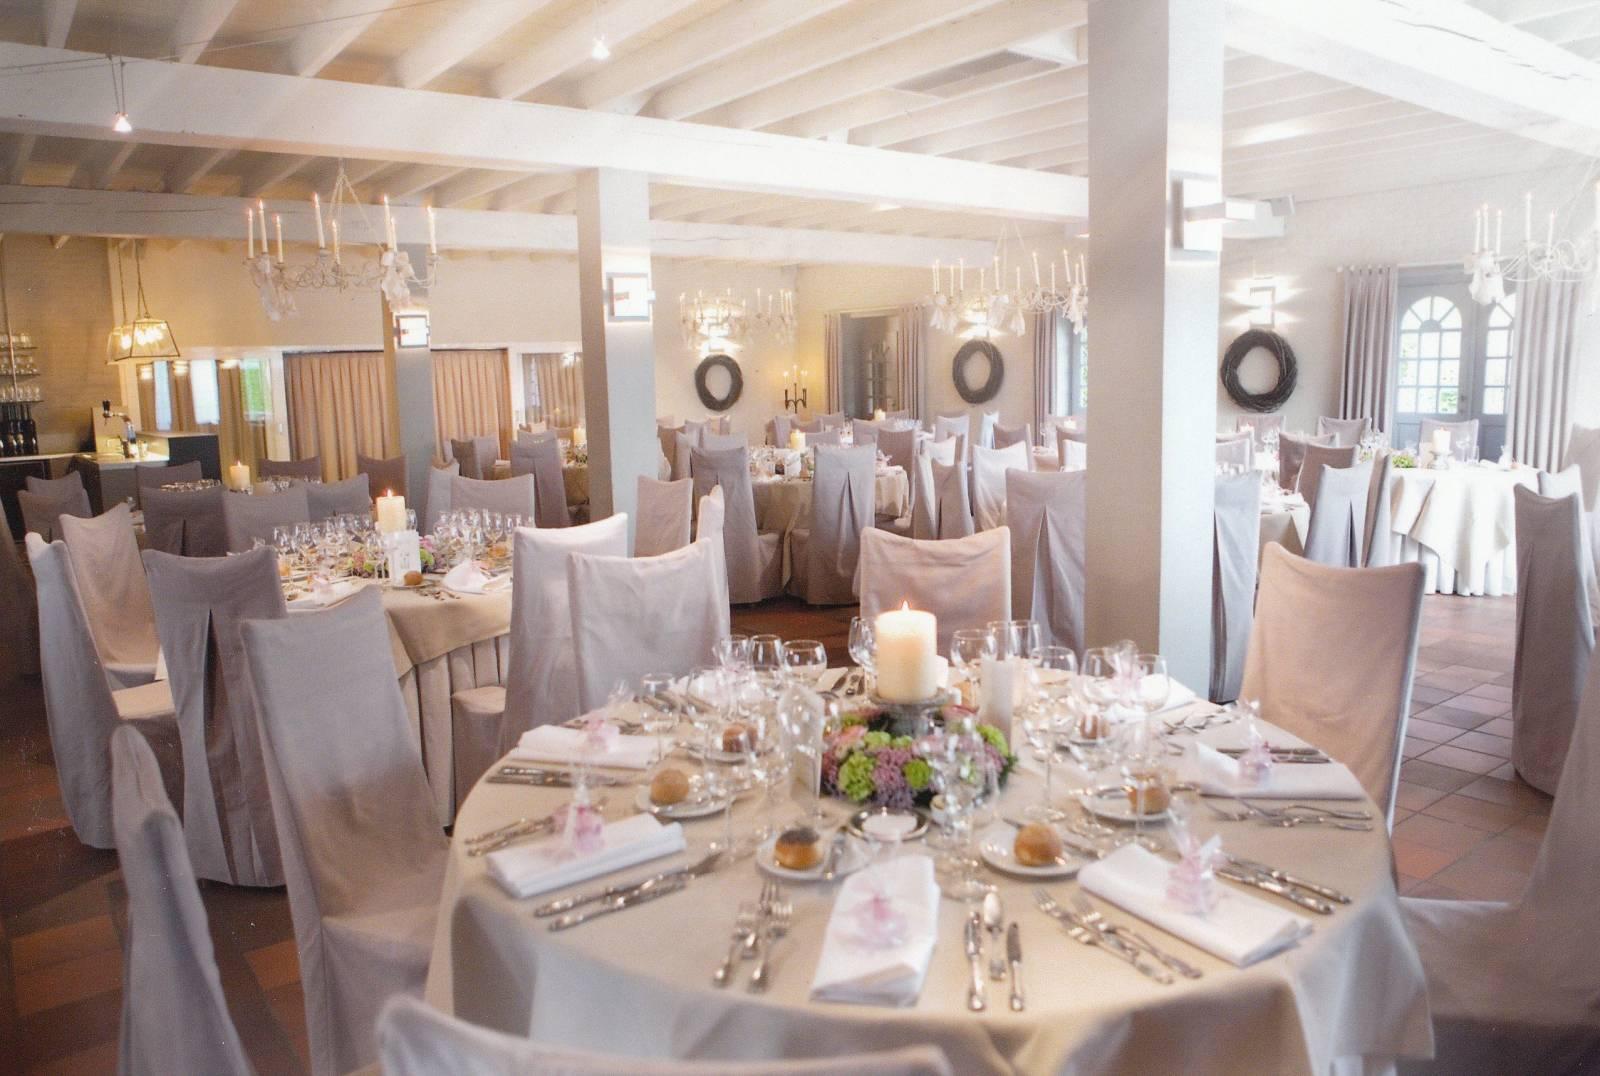 Geuzenhof - Feestzaal - House of Weddings - 4 (1)